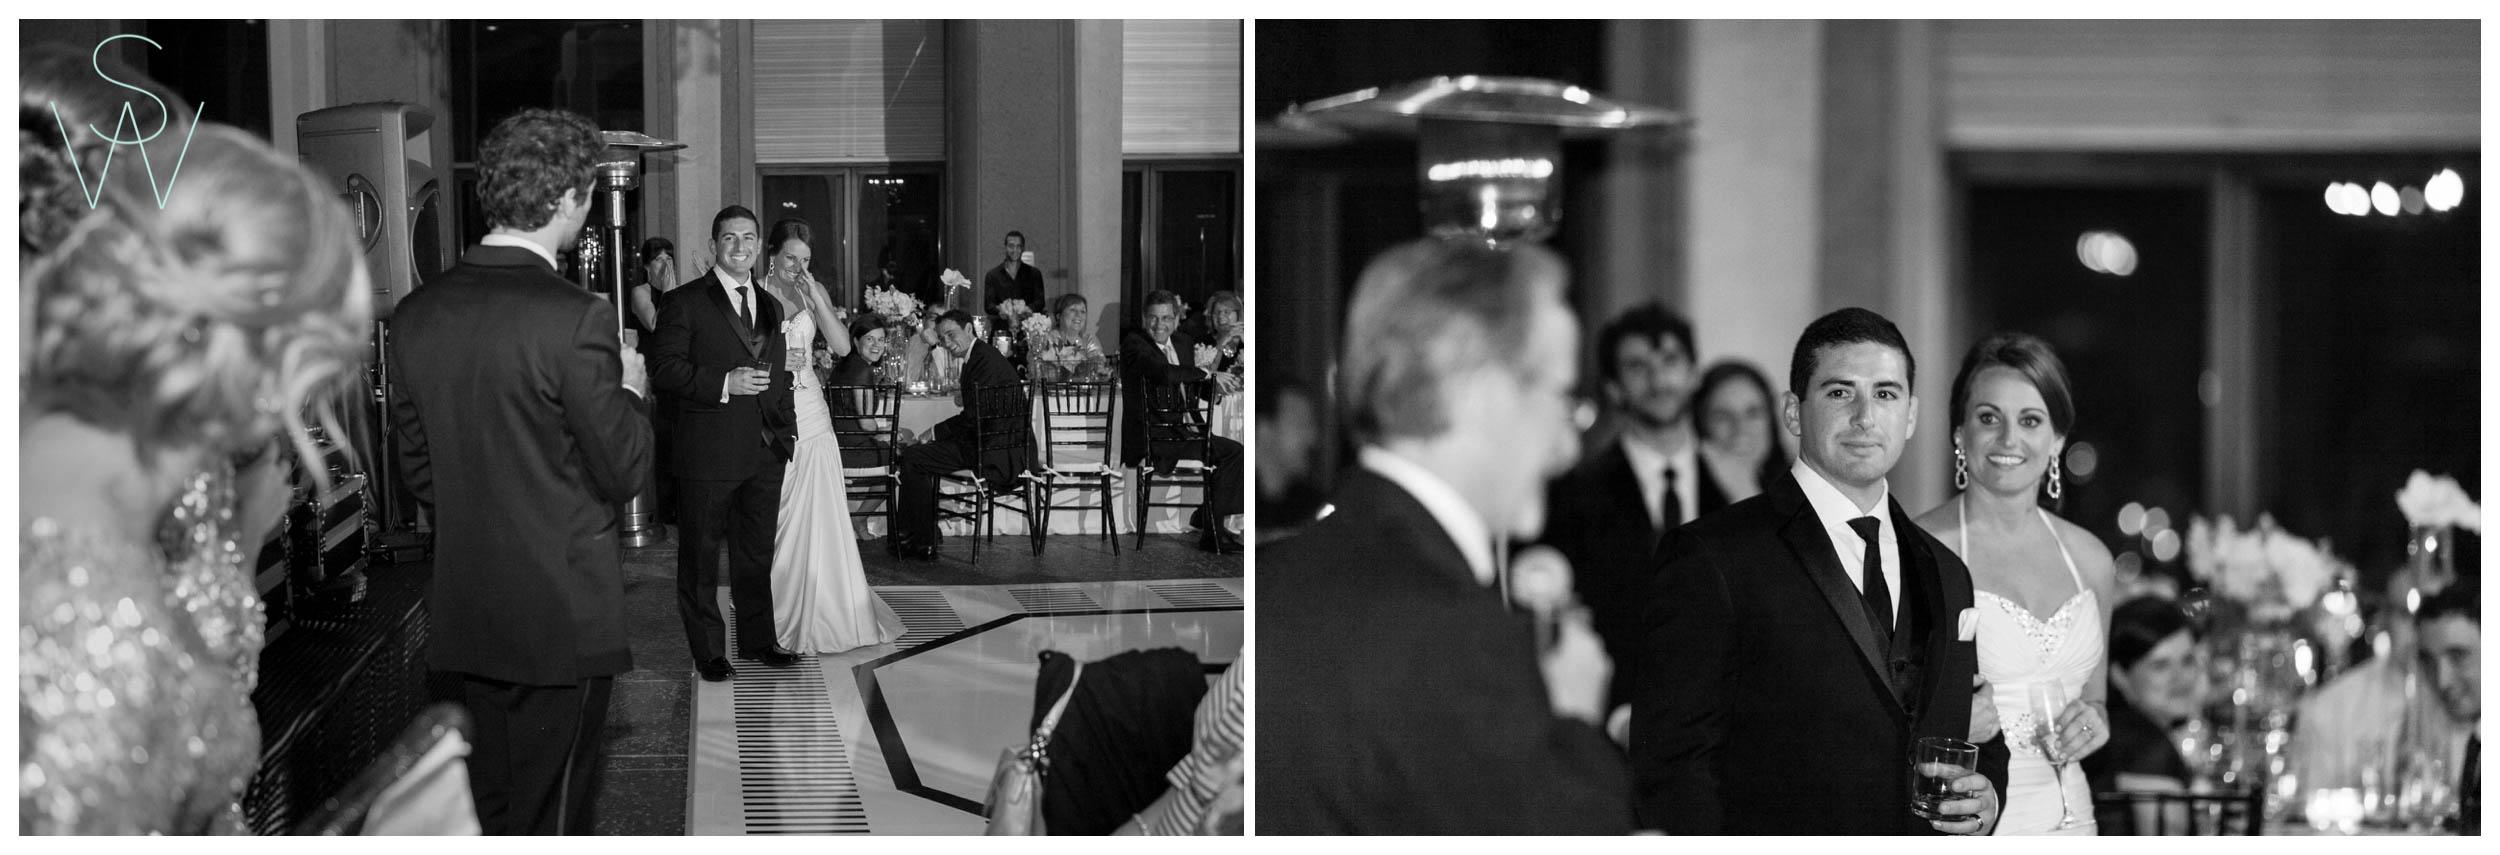 Shewanders.sdma_.wedding.photography-1091.jpg.wedding.photography-1091.jpg